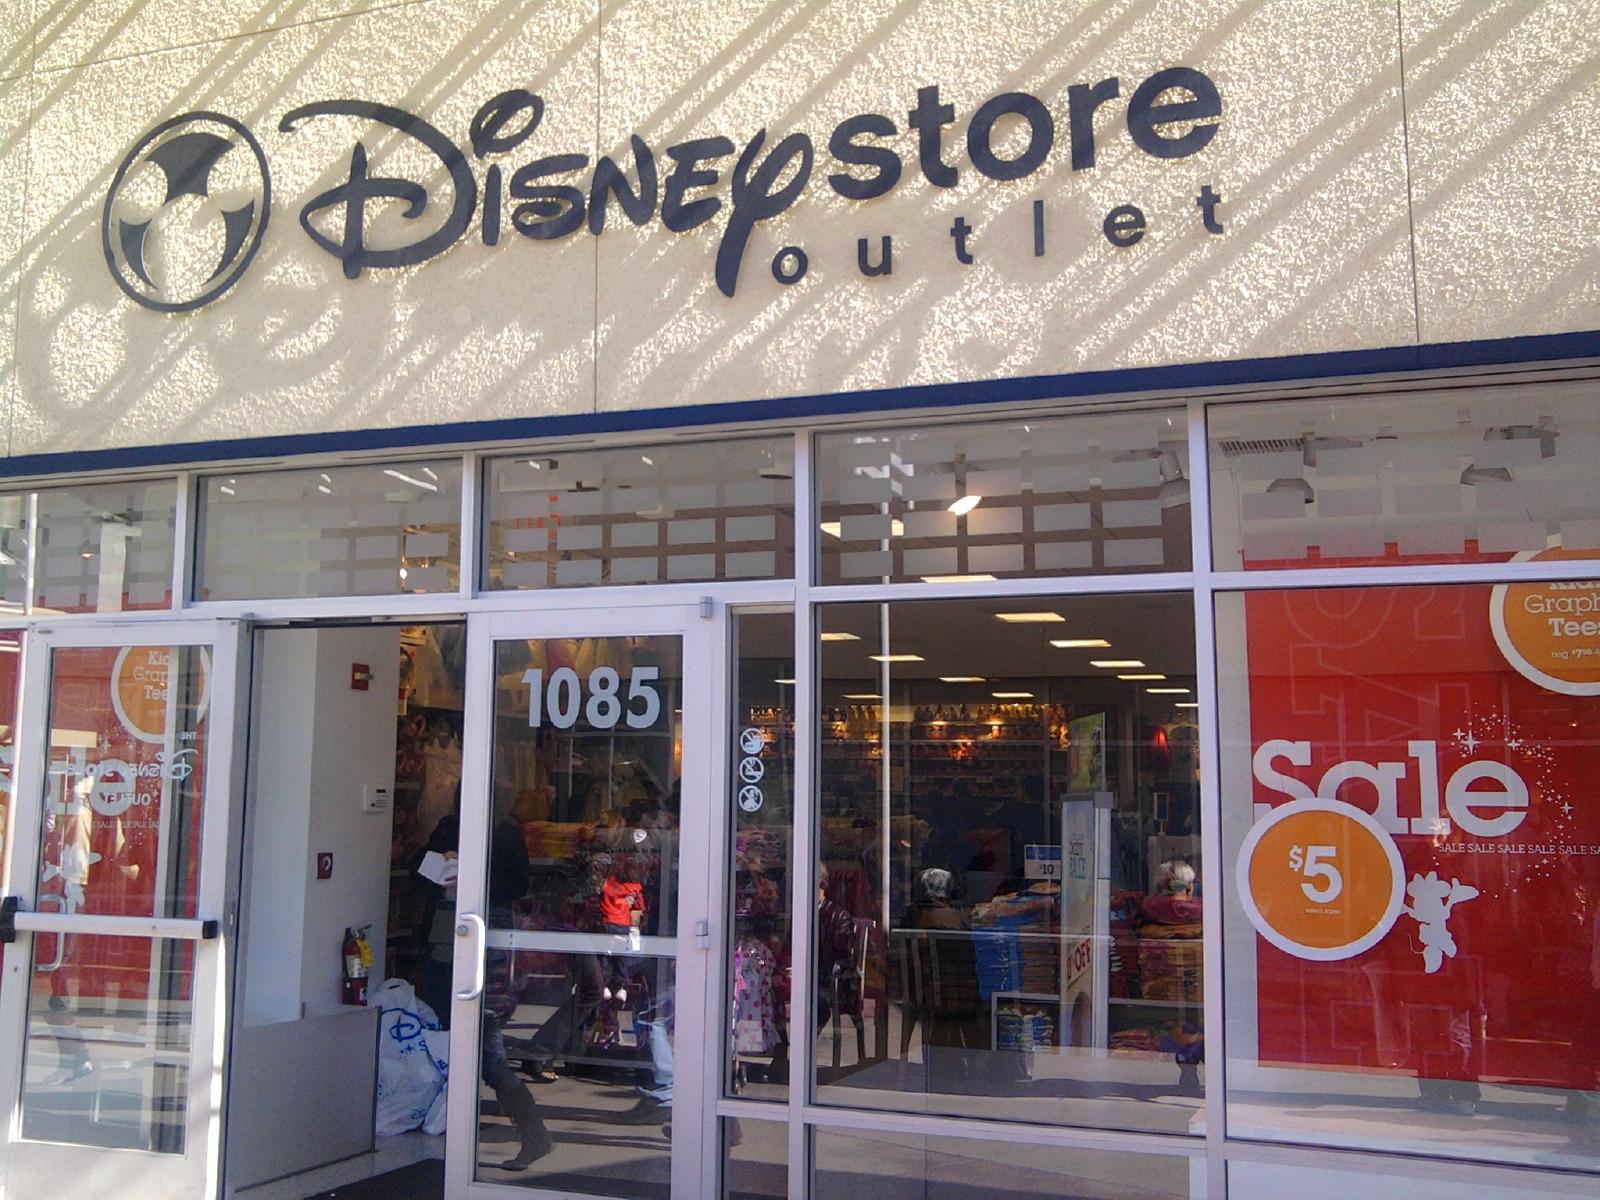 Polo Outlet Store Oklahoma City